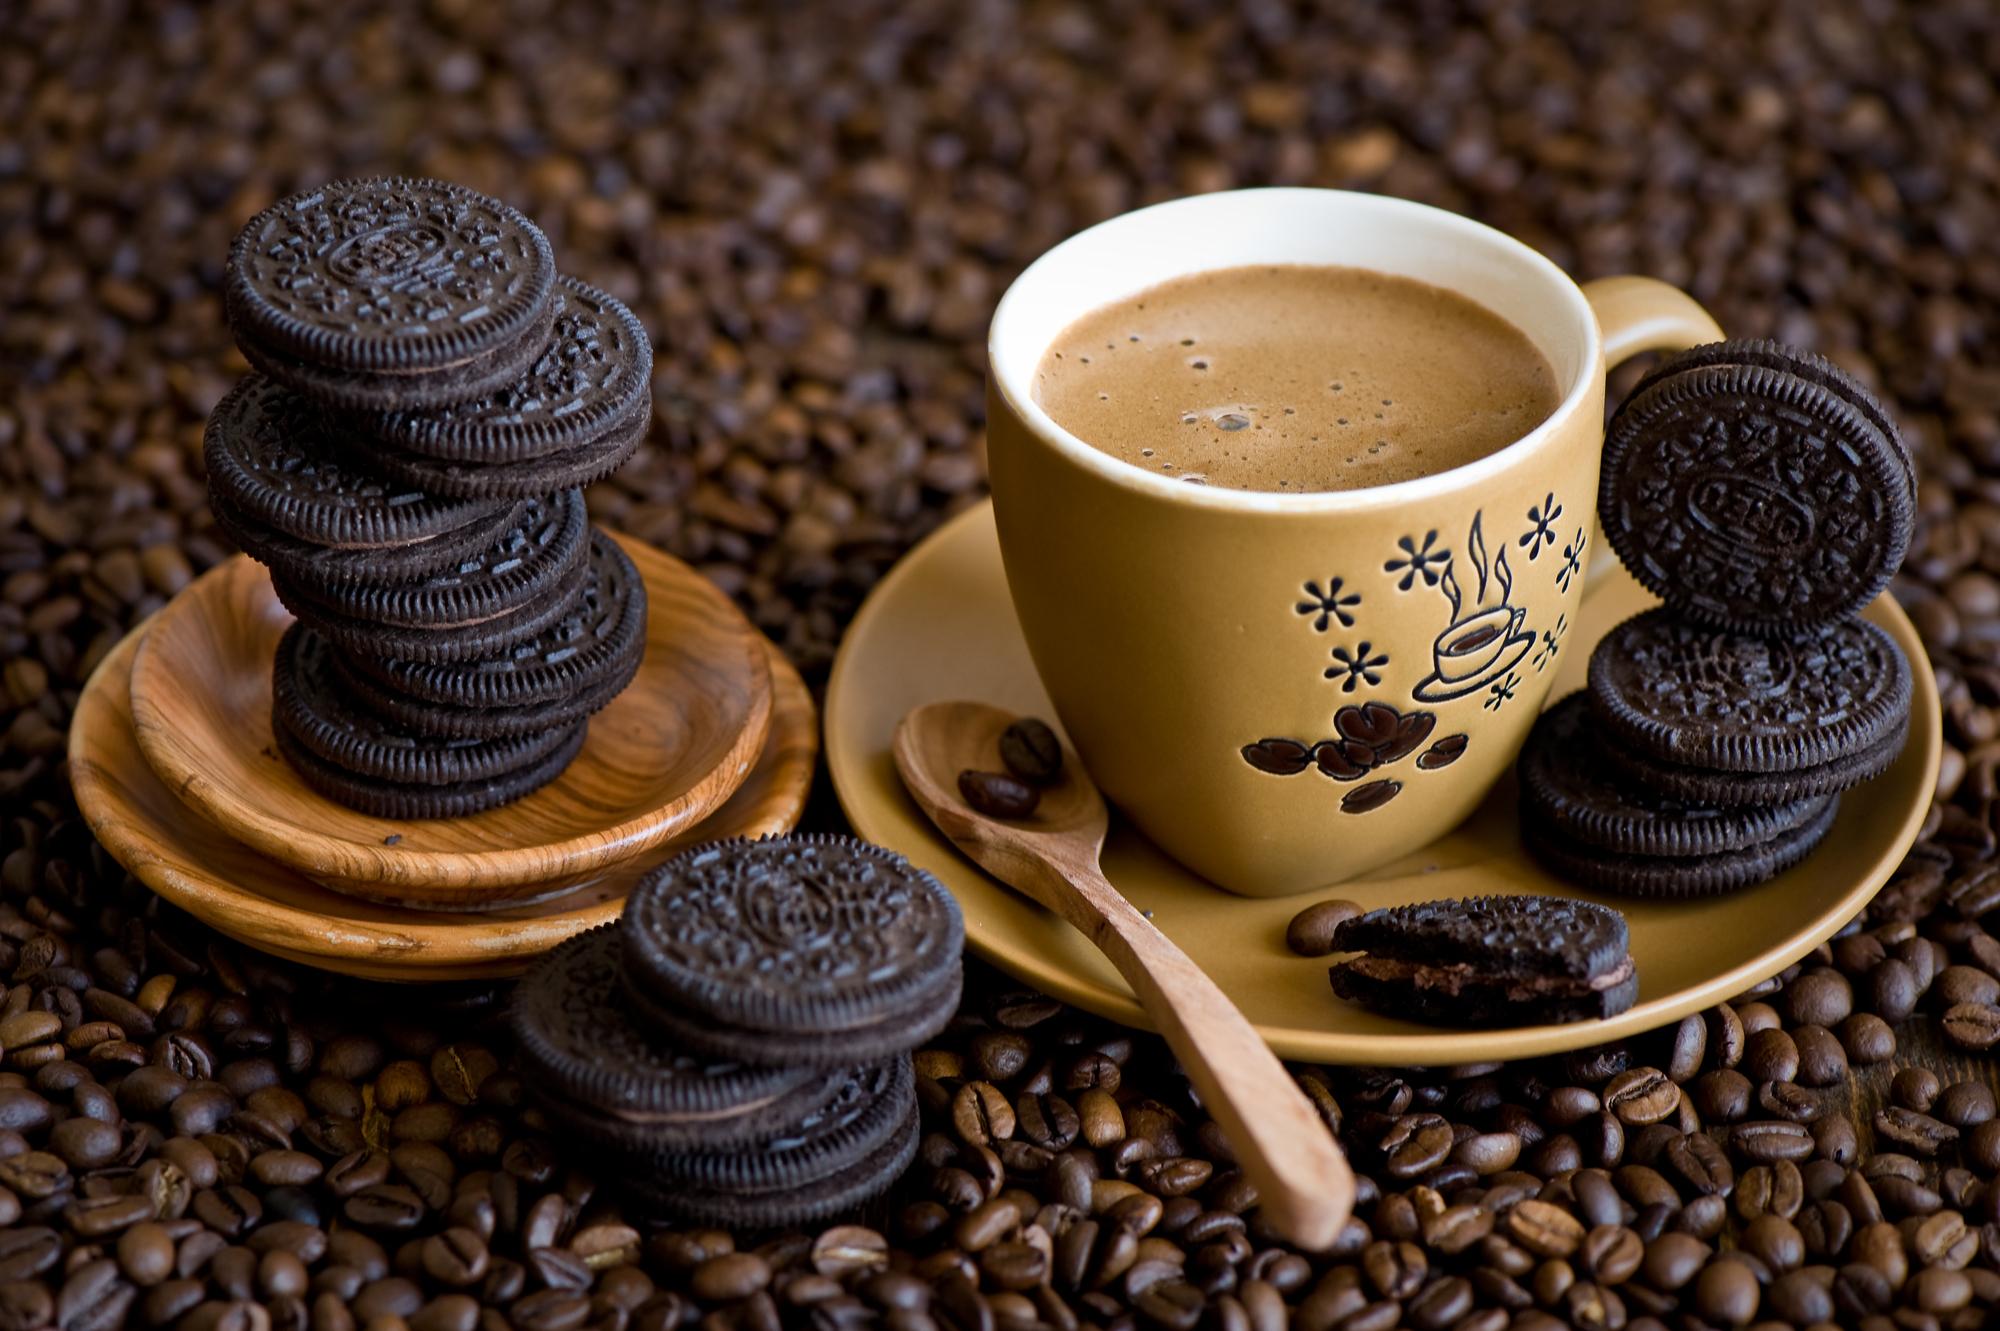 wallpaper ndash coffee - photo #39